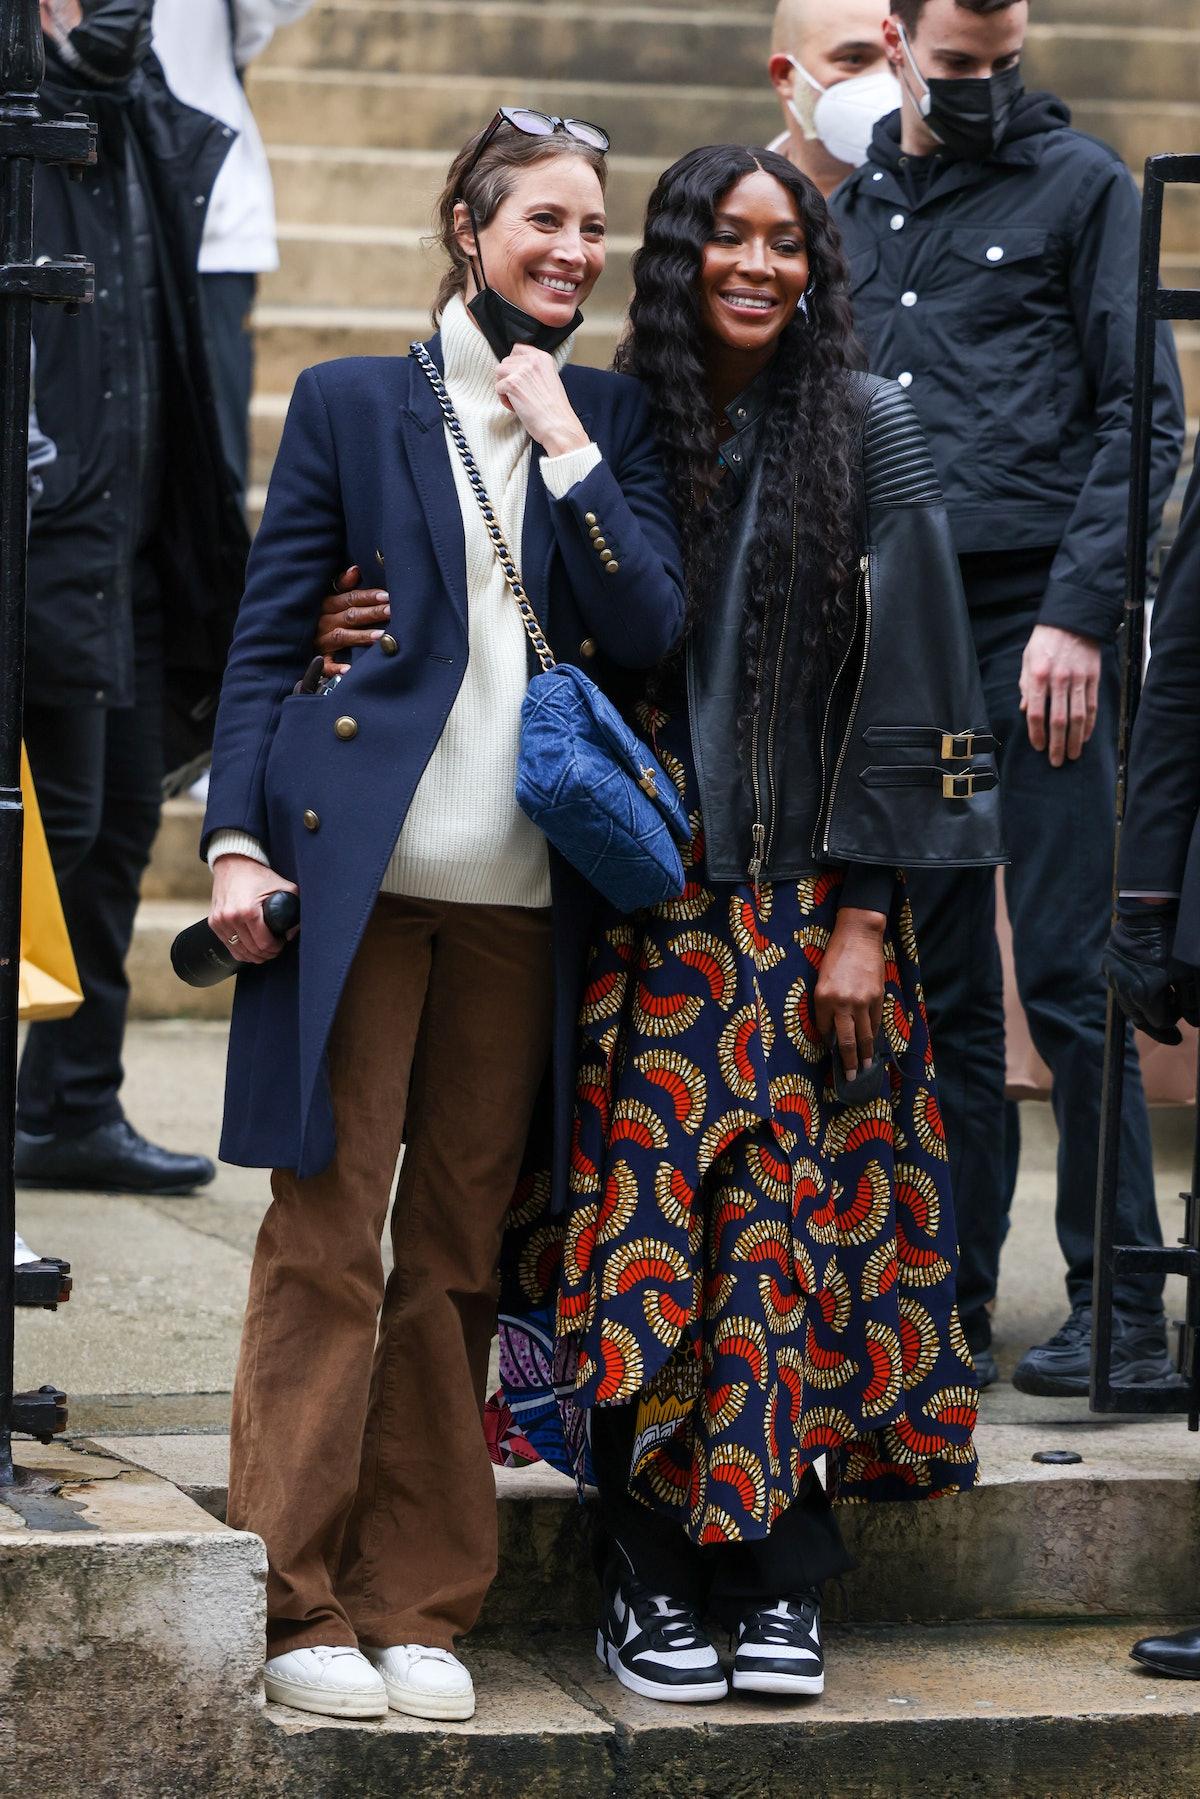 Christy Turlington and Naomi Campbell on steps